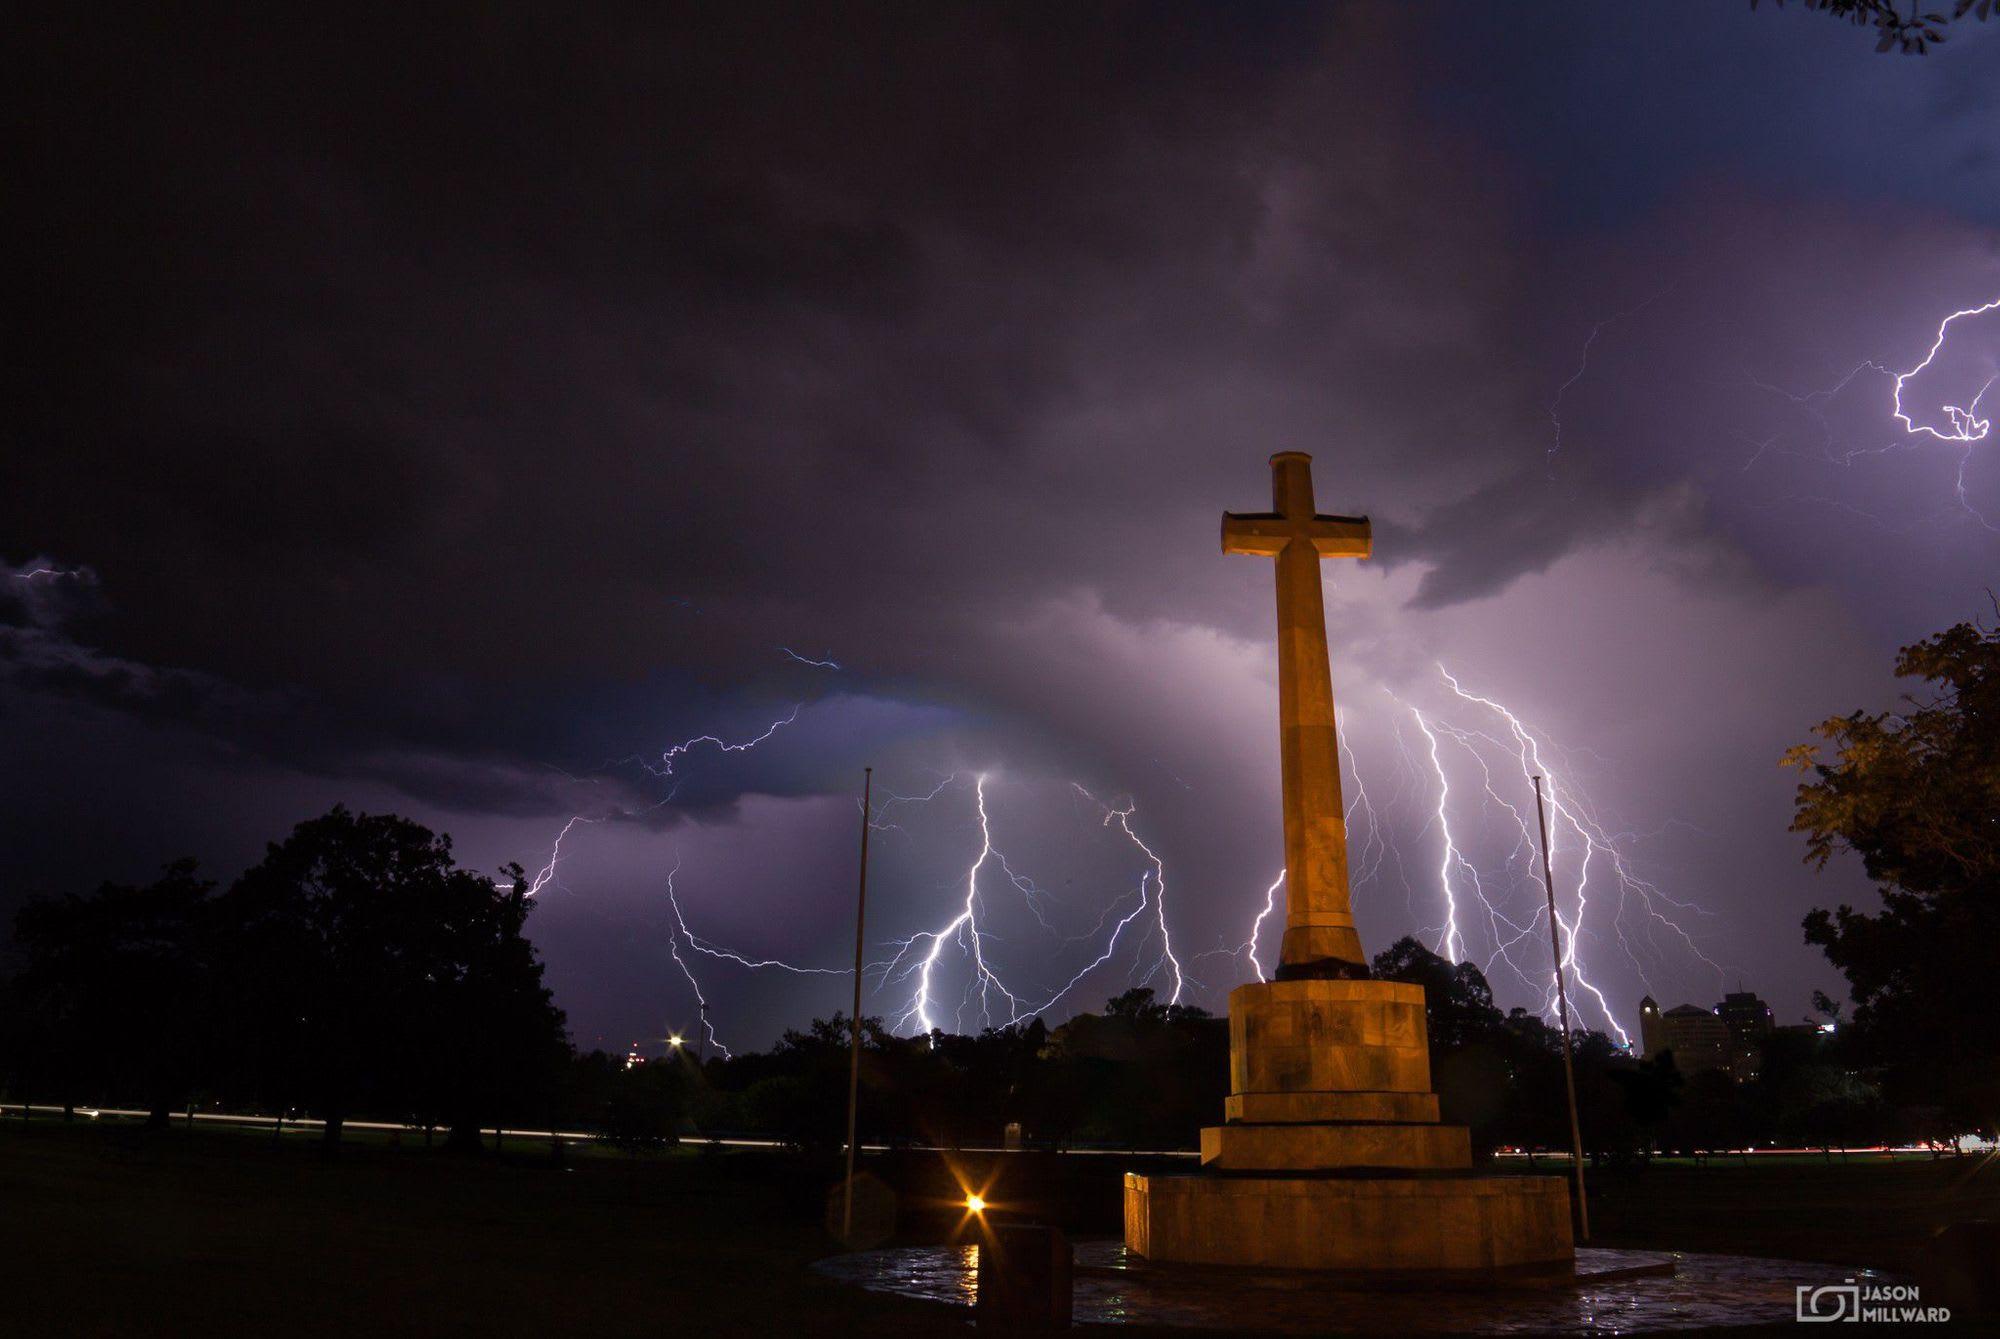 Thunderbolt and lightning